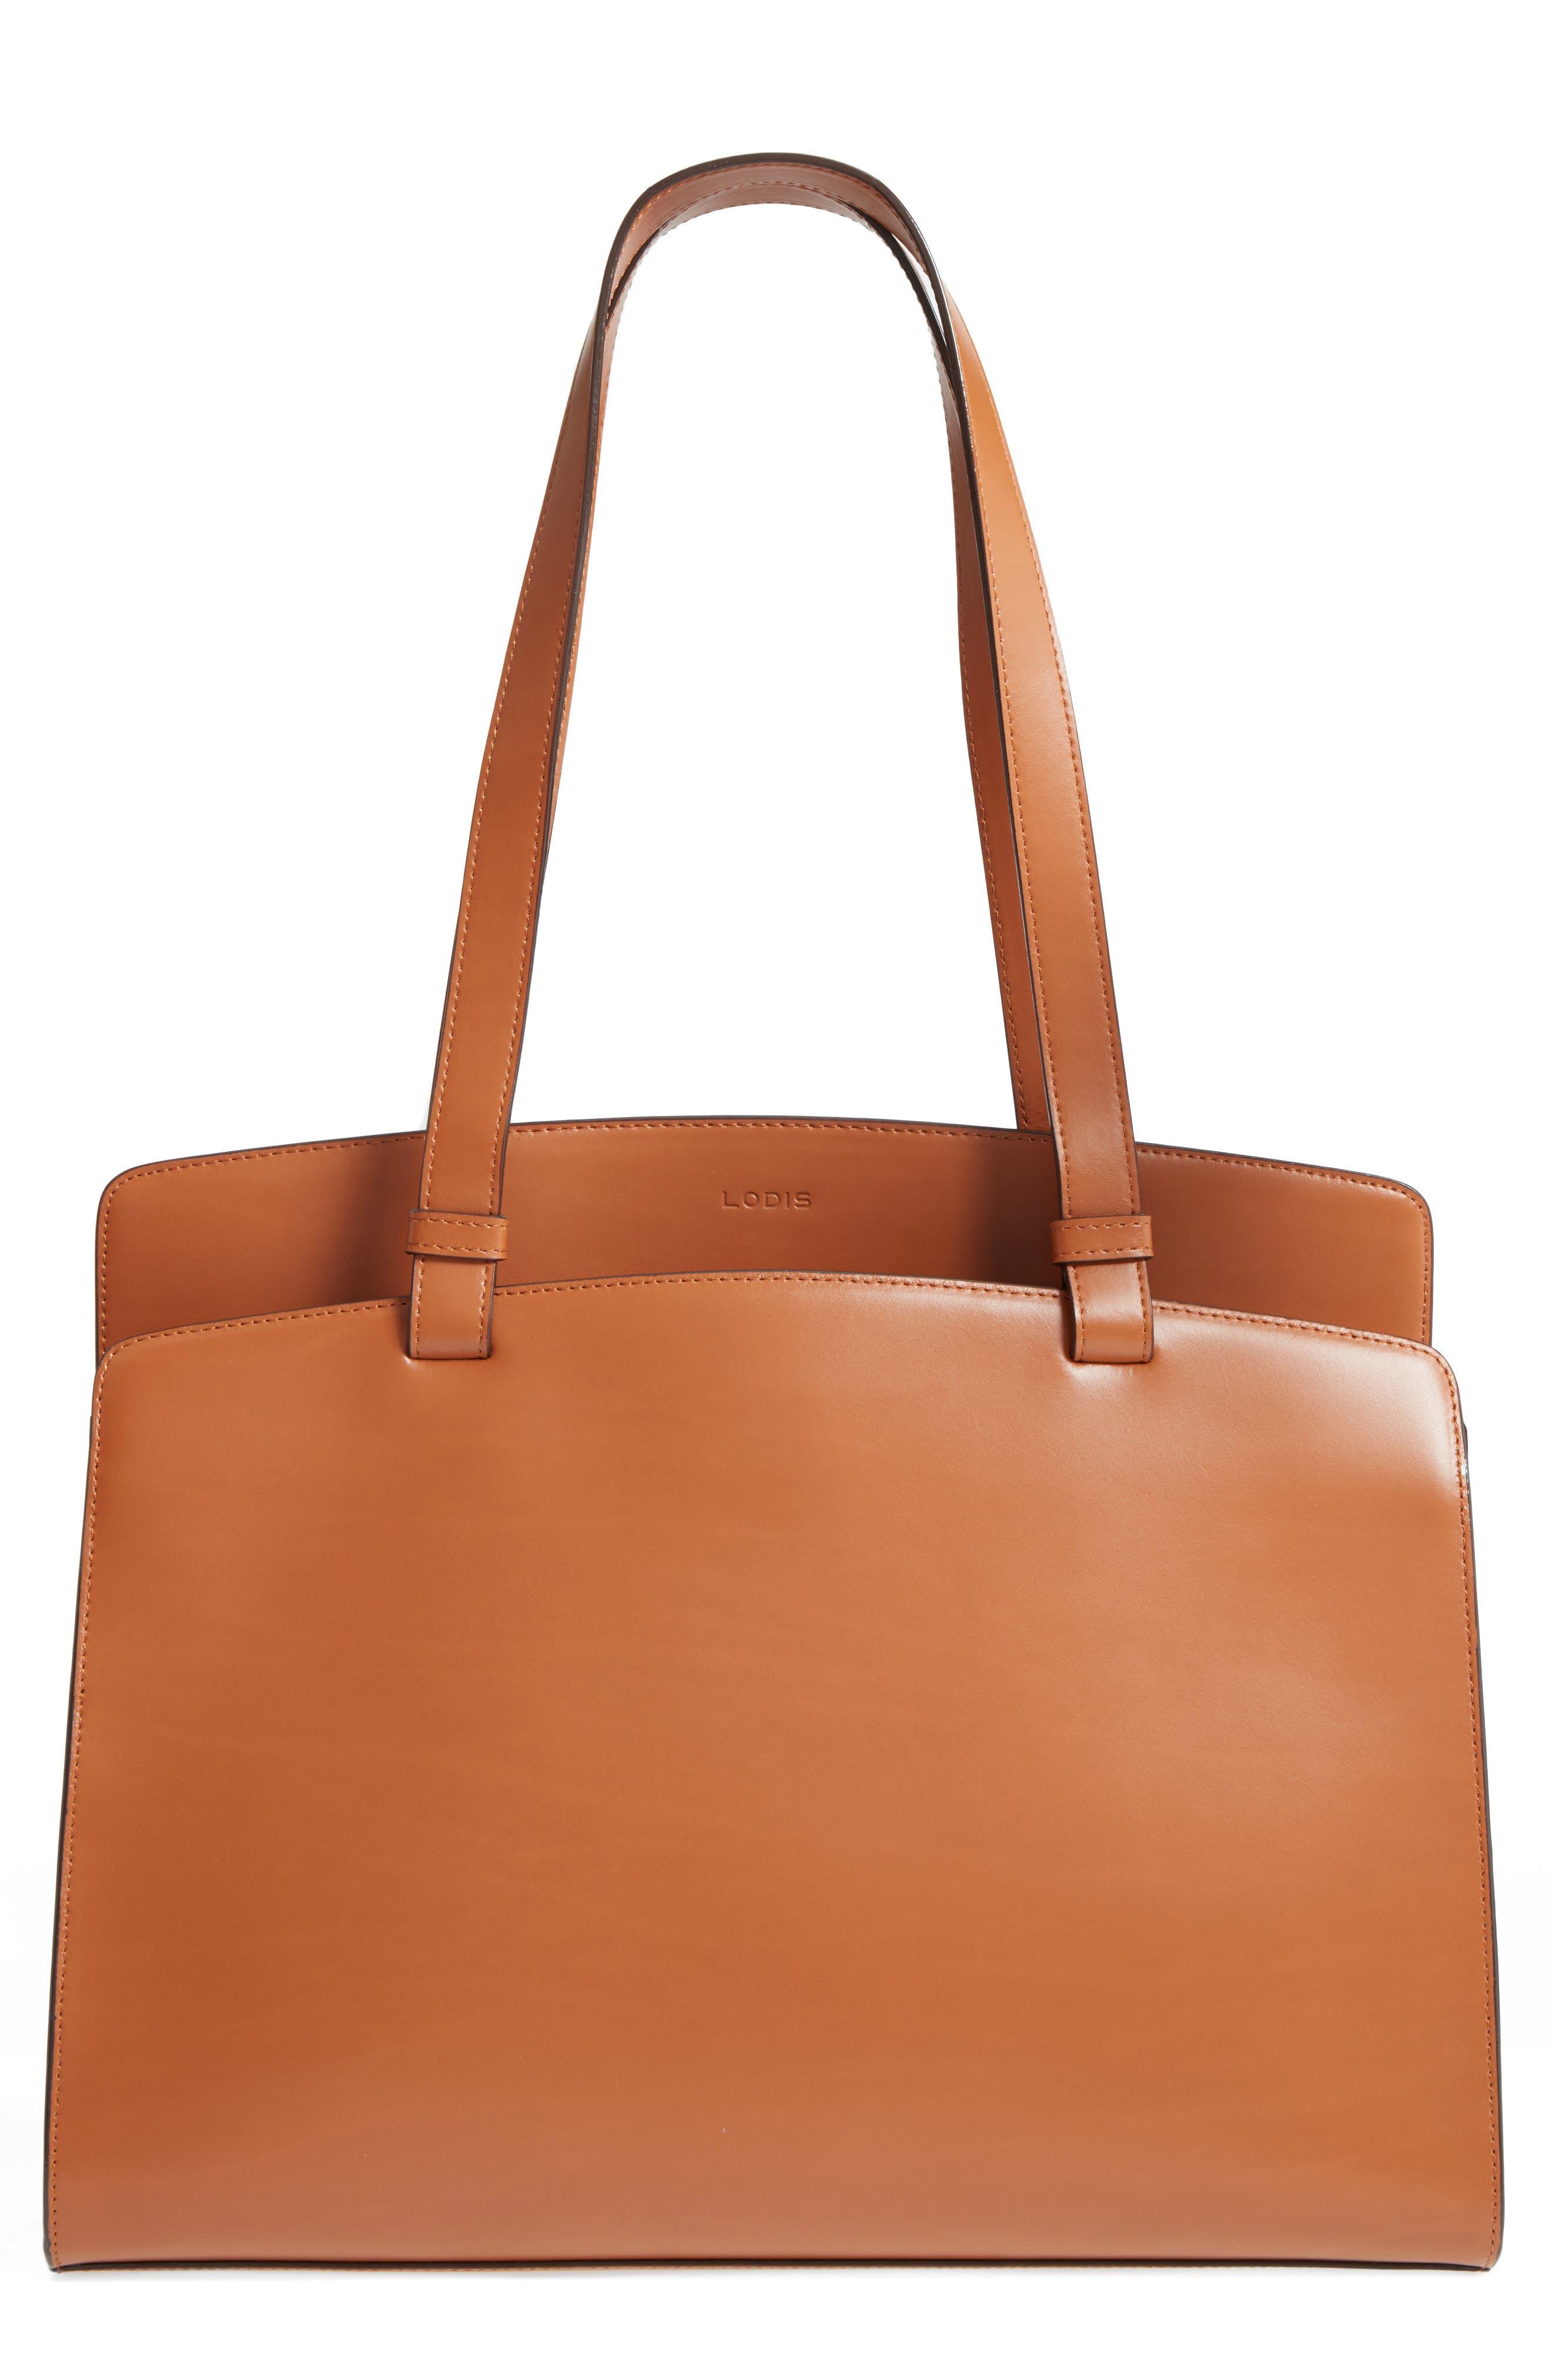 Lodis Jana - Work Leather Tote